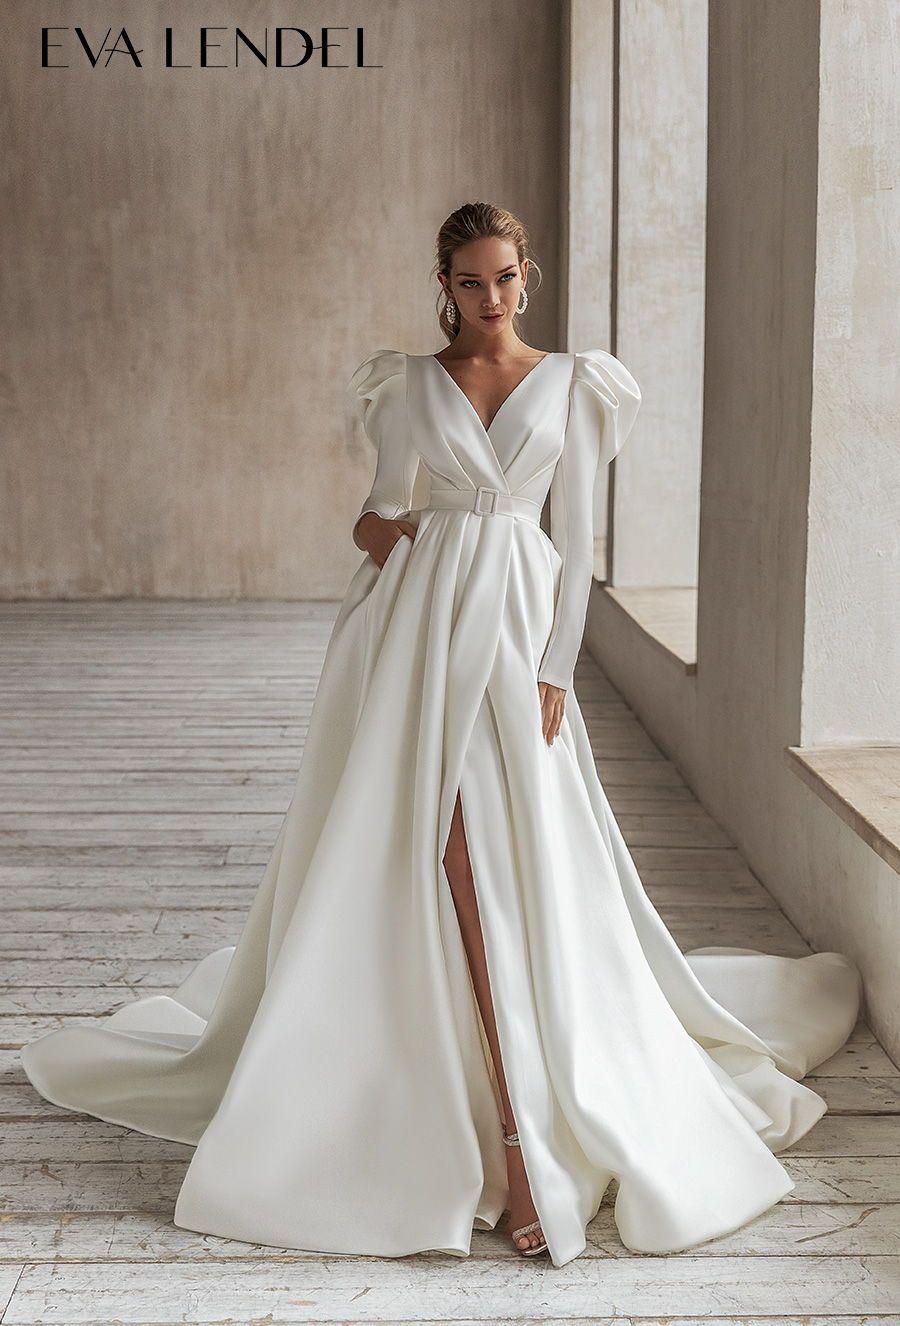 Eva Lendel 2021 Wedding Dresses Less Is More Bridal Collection Wedding Inspirasi Modern Wedding Dress Wedding Dresses Chic Wedding Dresses [ 1326 x 900 Pixel ]